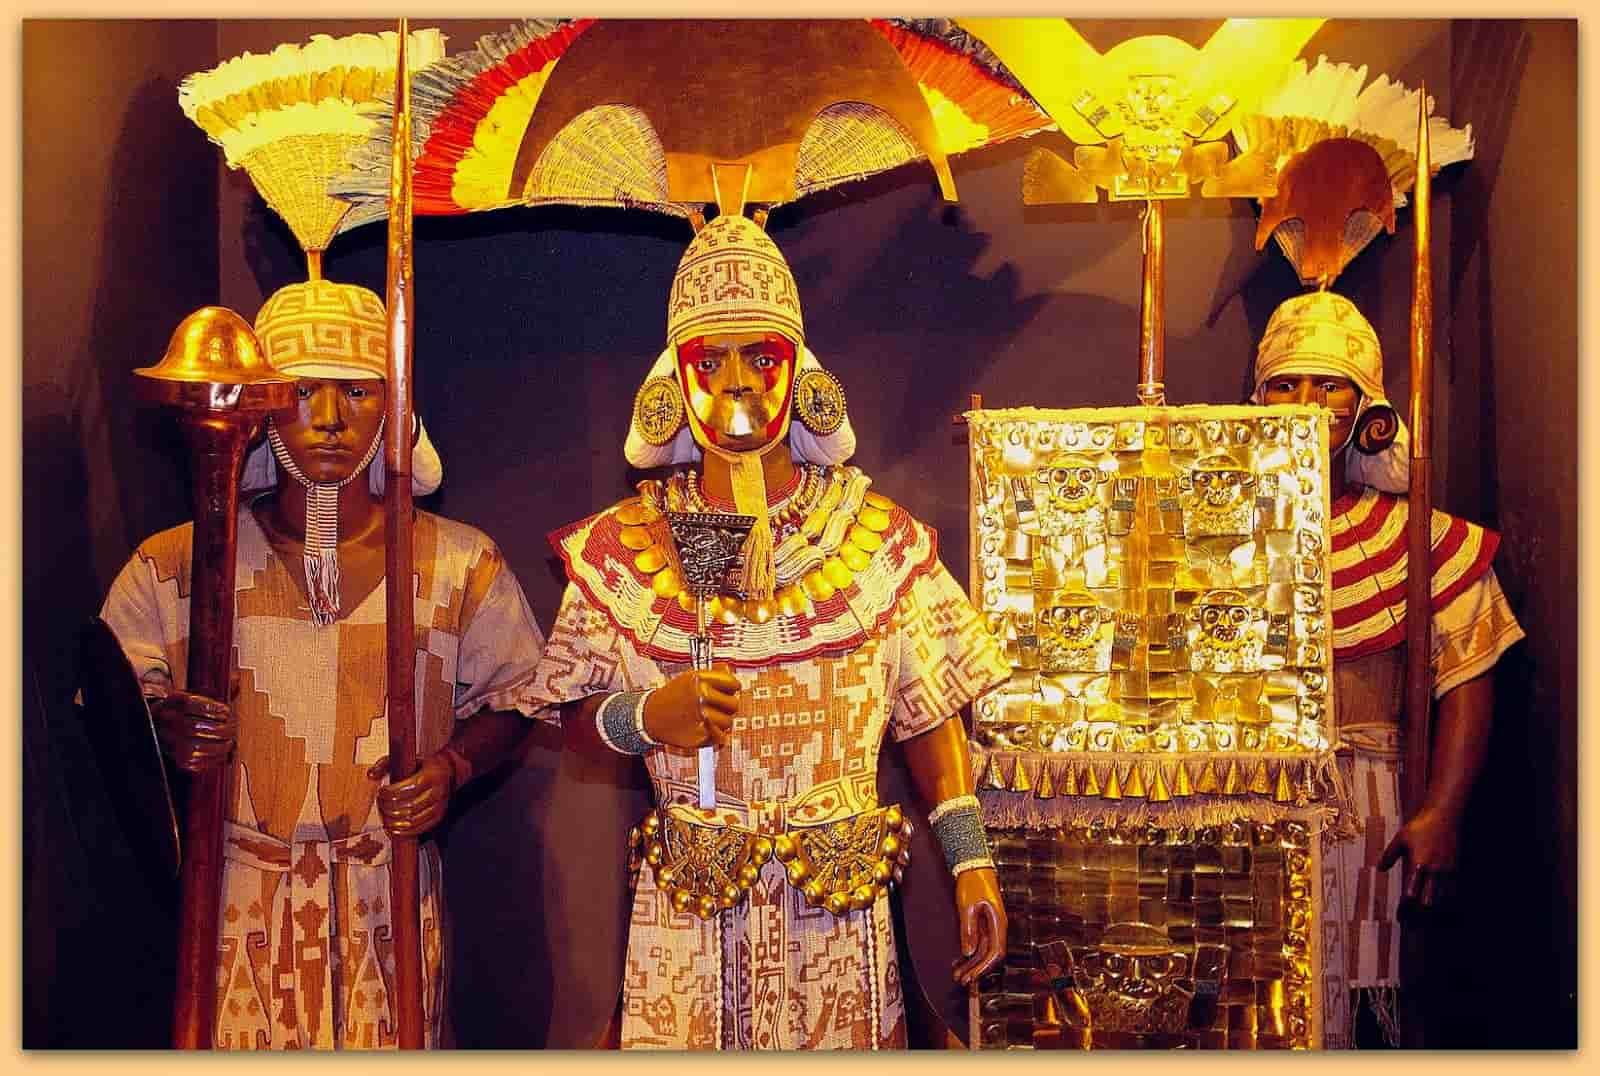 O βασιλικός τάφος του Sipan στο Περού, είναι... Ελληνικός;